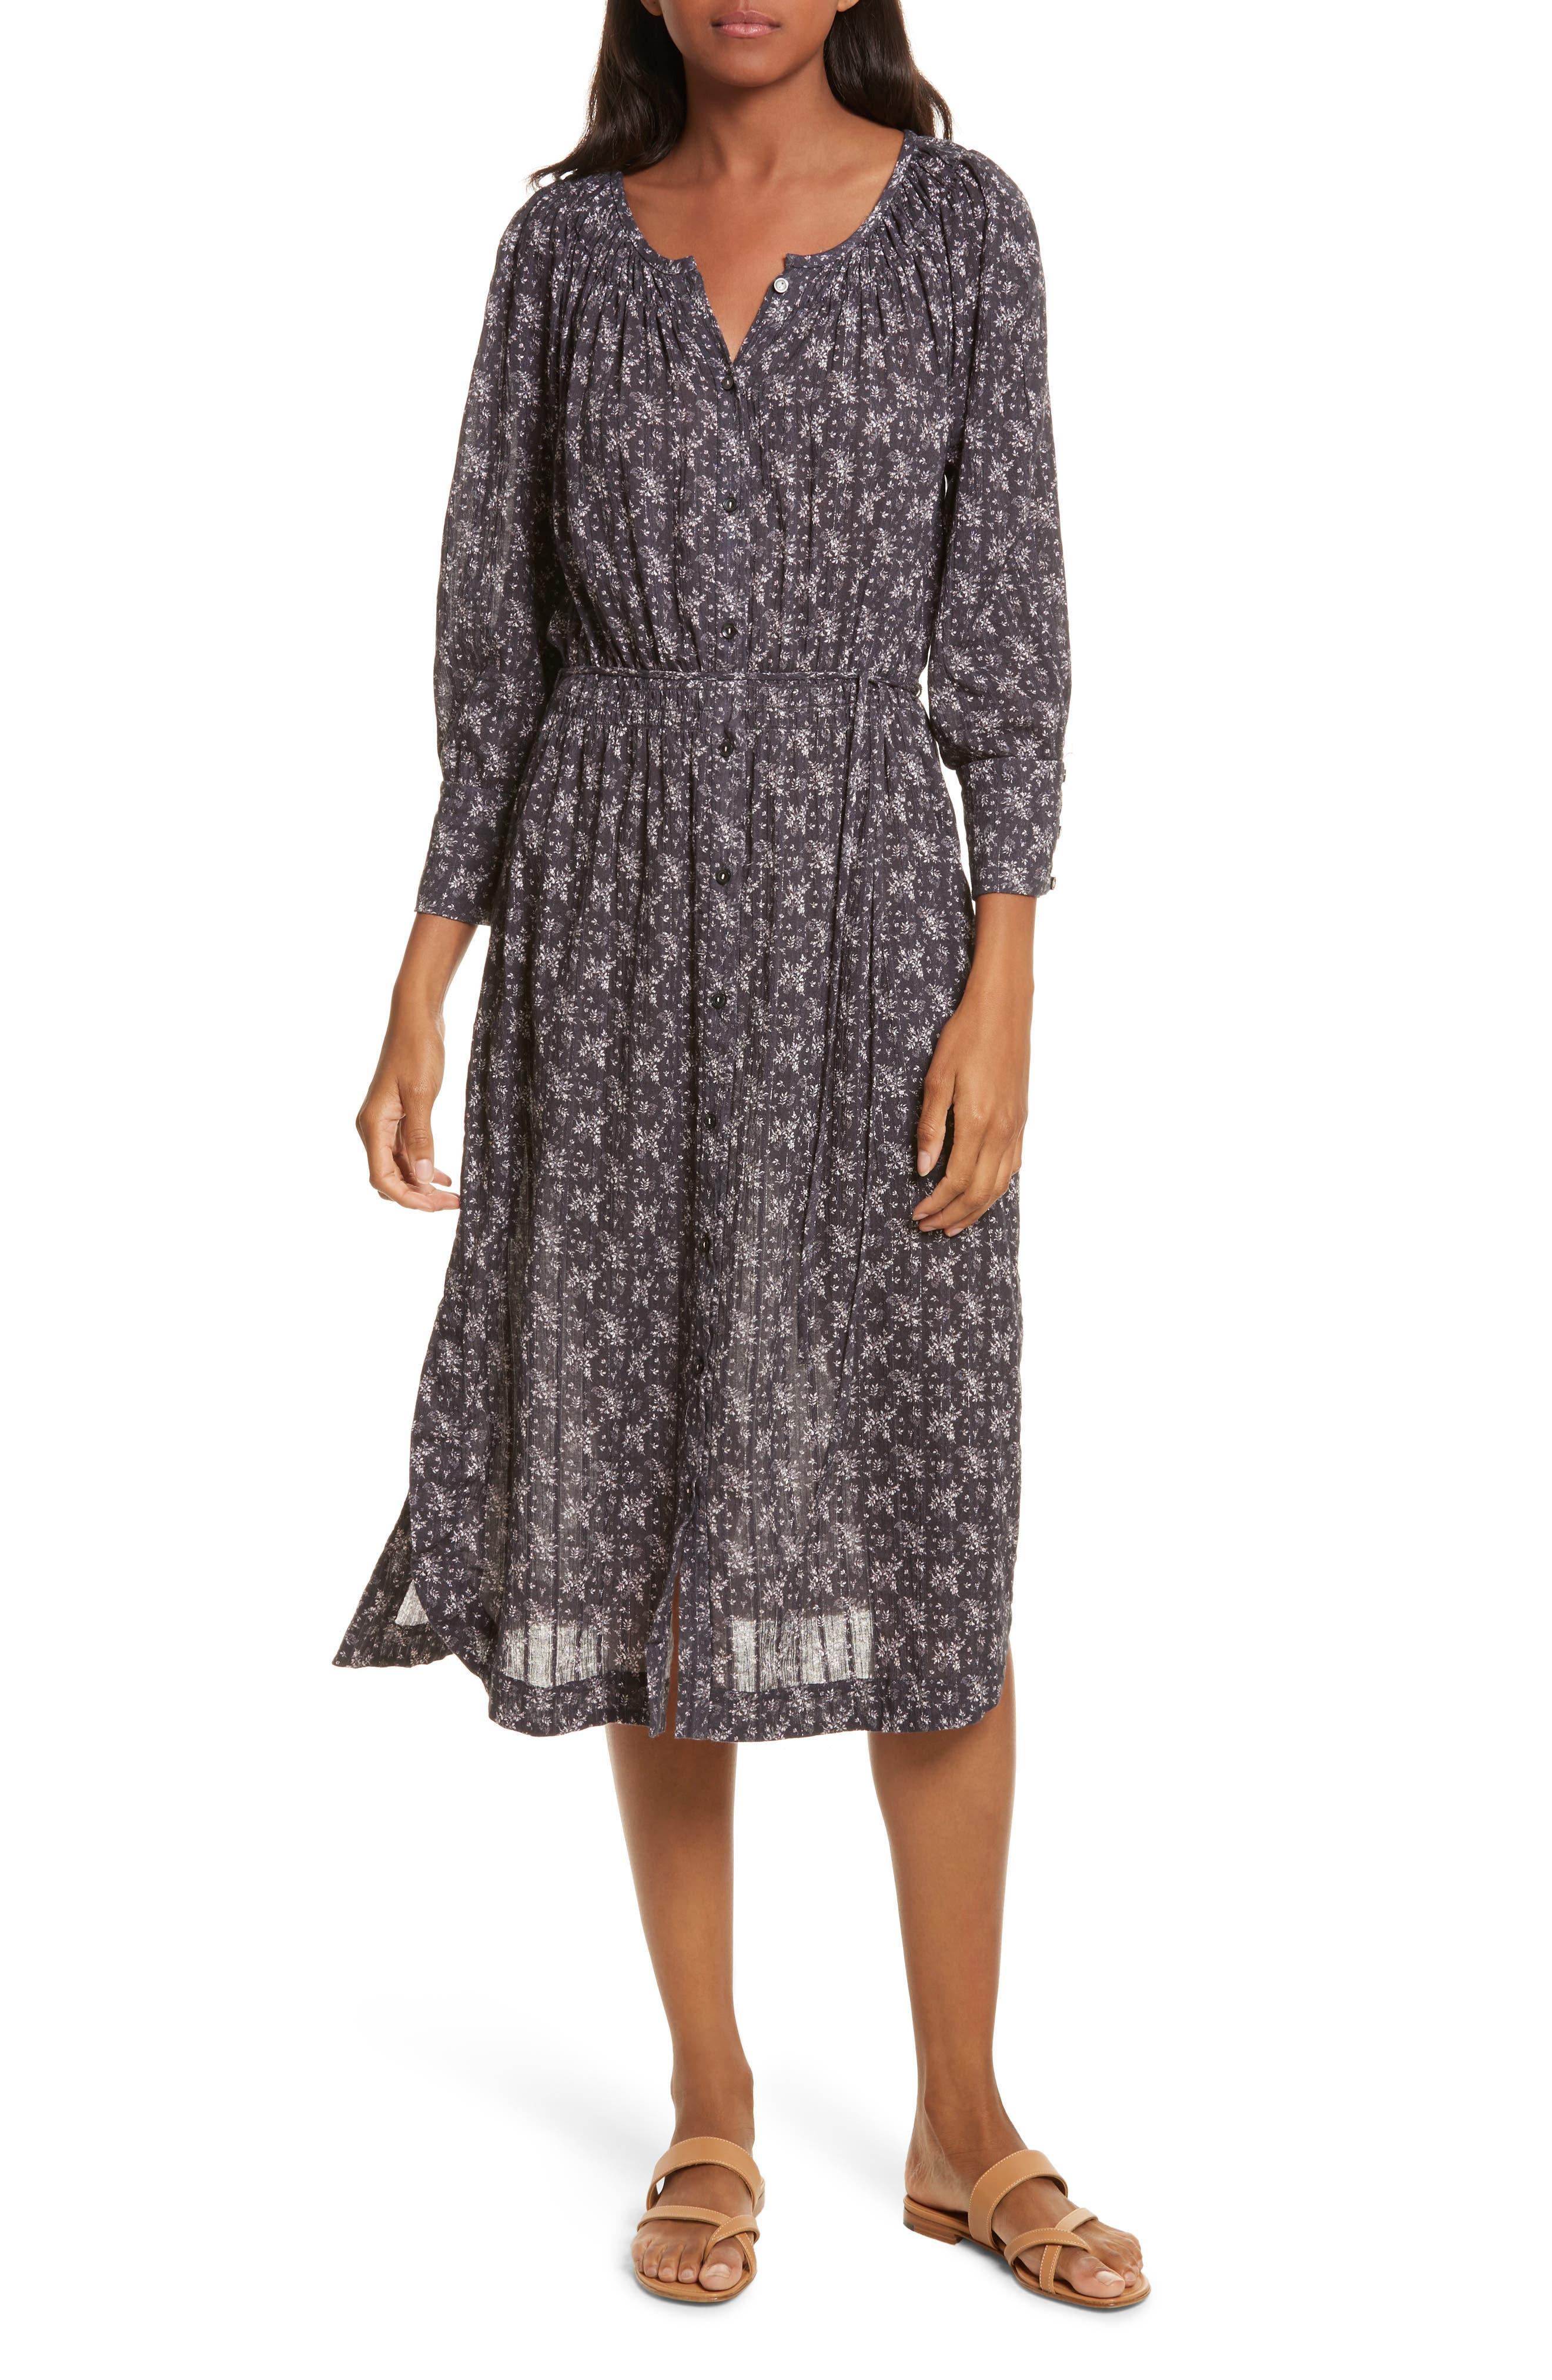 Alternate Image 1 Selected - La Vie Rebecca Taylor Angelique Long Sleeve Dress